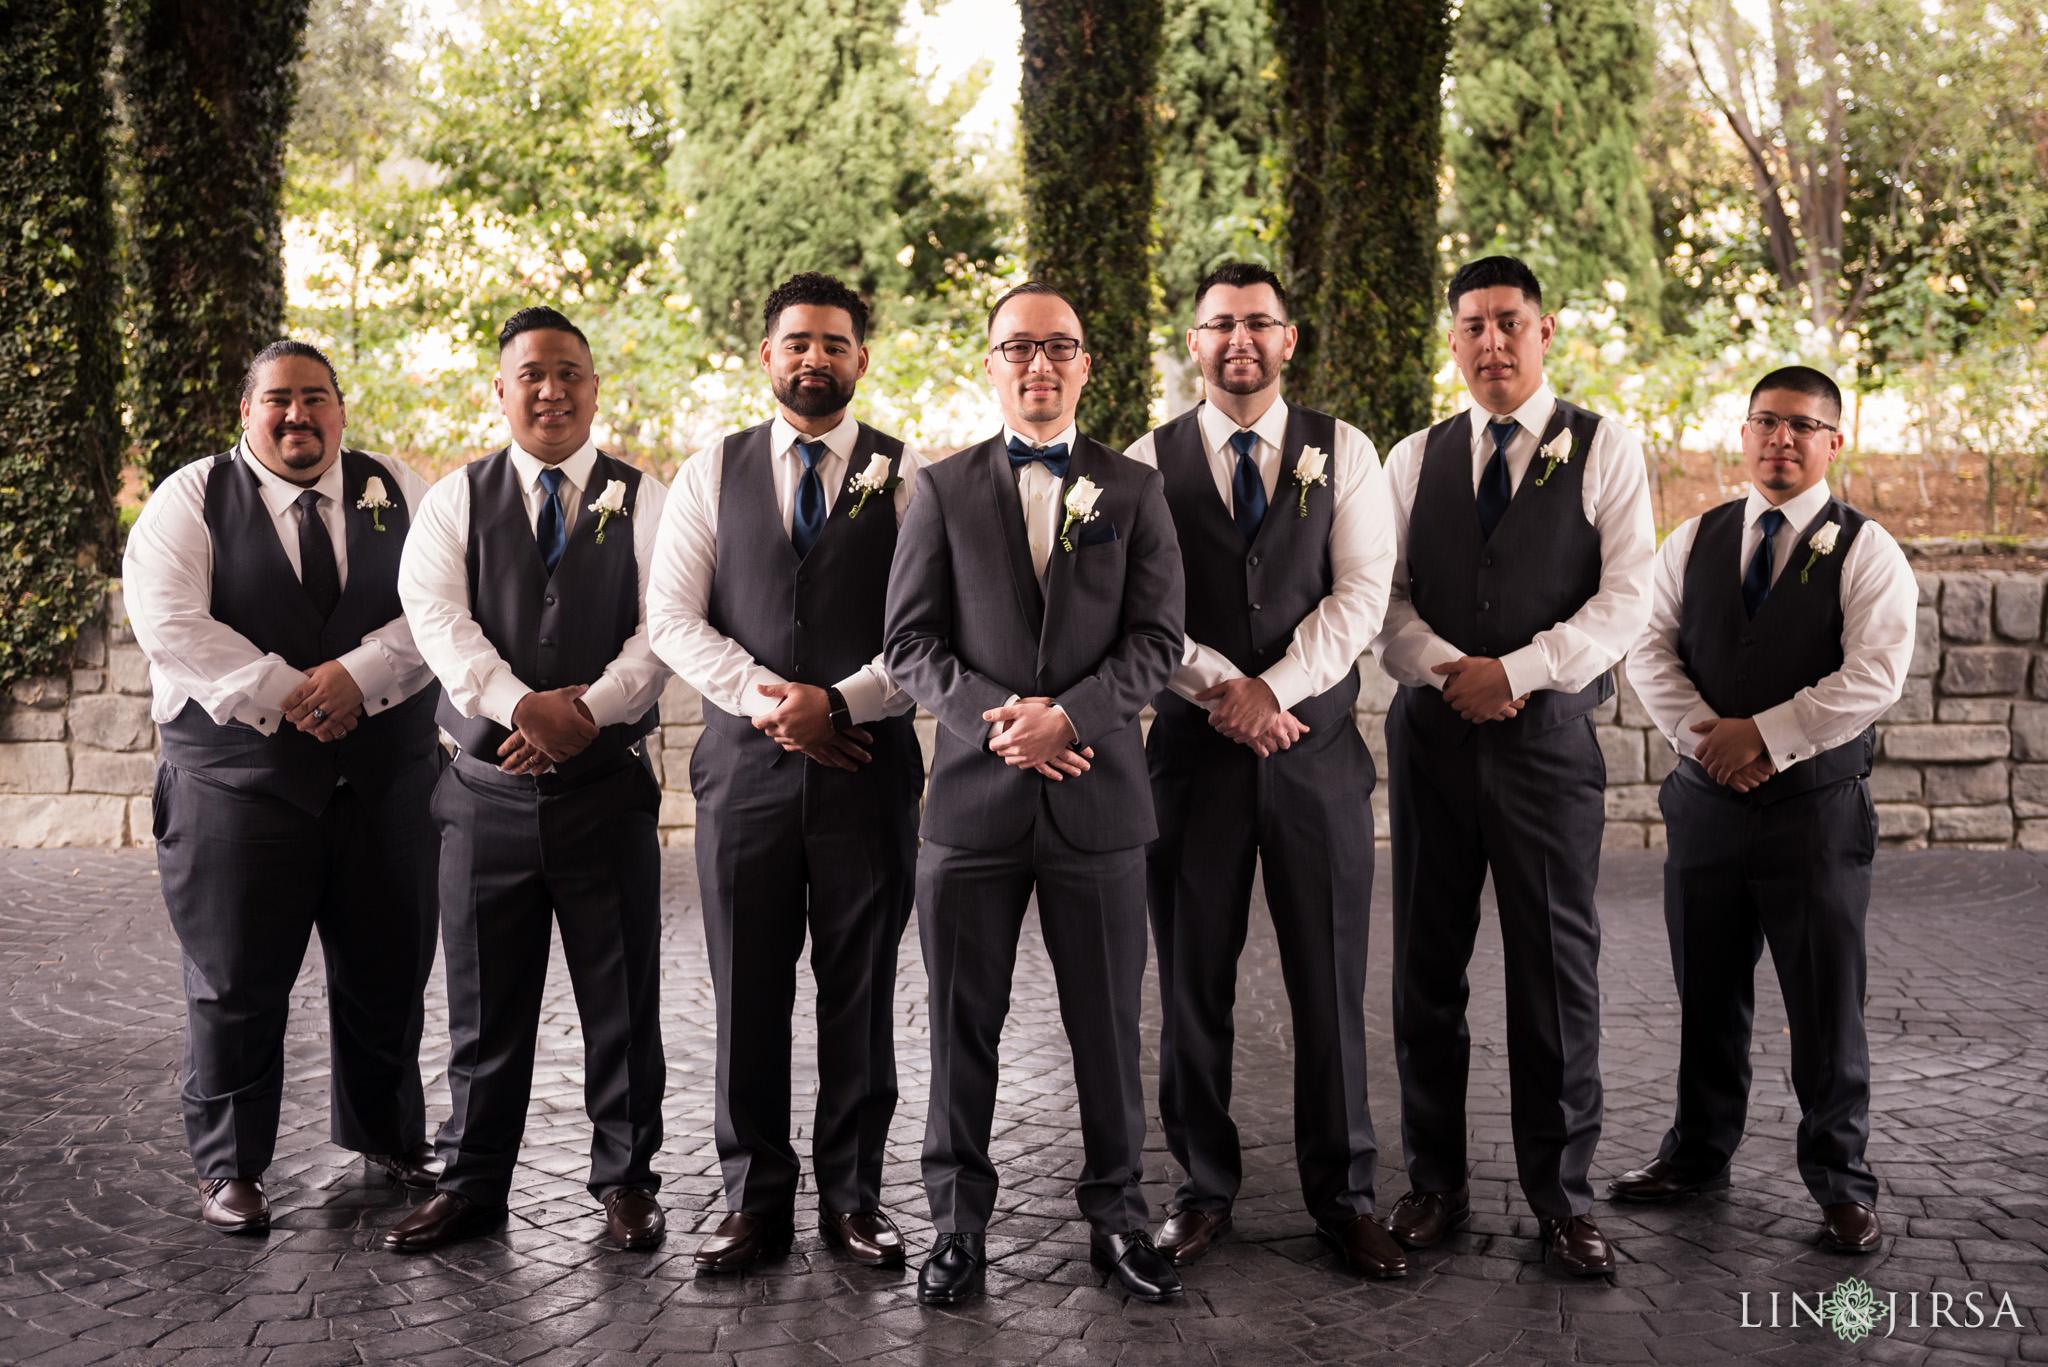 15 turnip rose promenade orange county groom wedding photography